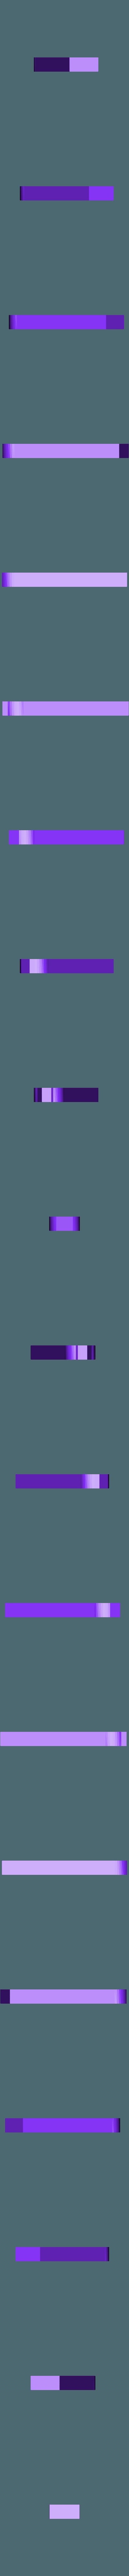 LAVE TURECA RACOR-EL BONAERENSE.STL Download free STL file SPANNER WRENCH • 3D printing model, ELBONAERENSE